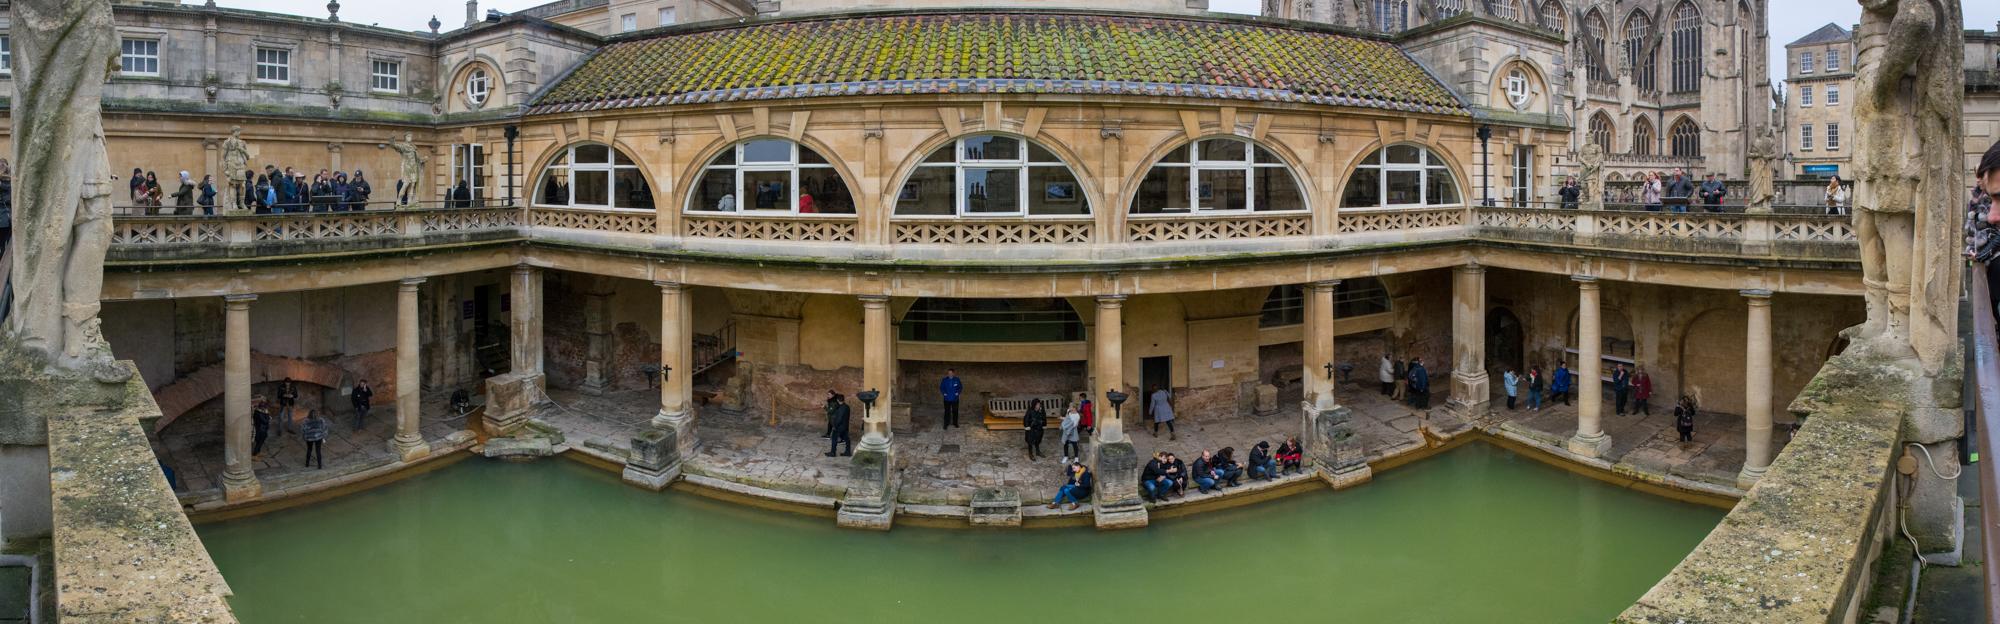 Baths-15.jpg